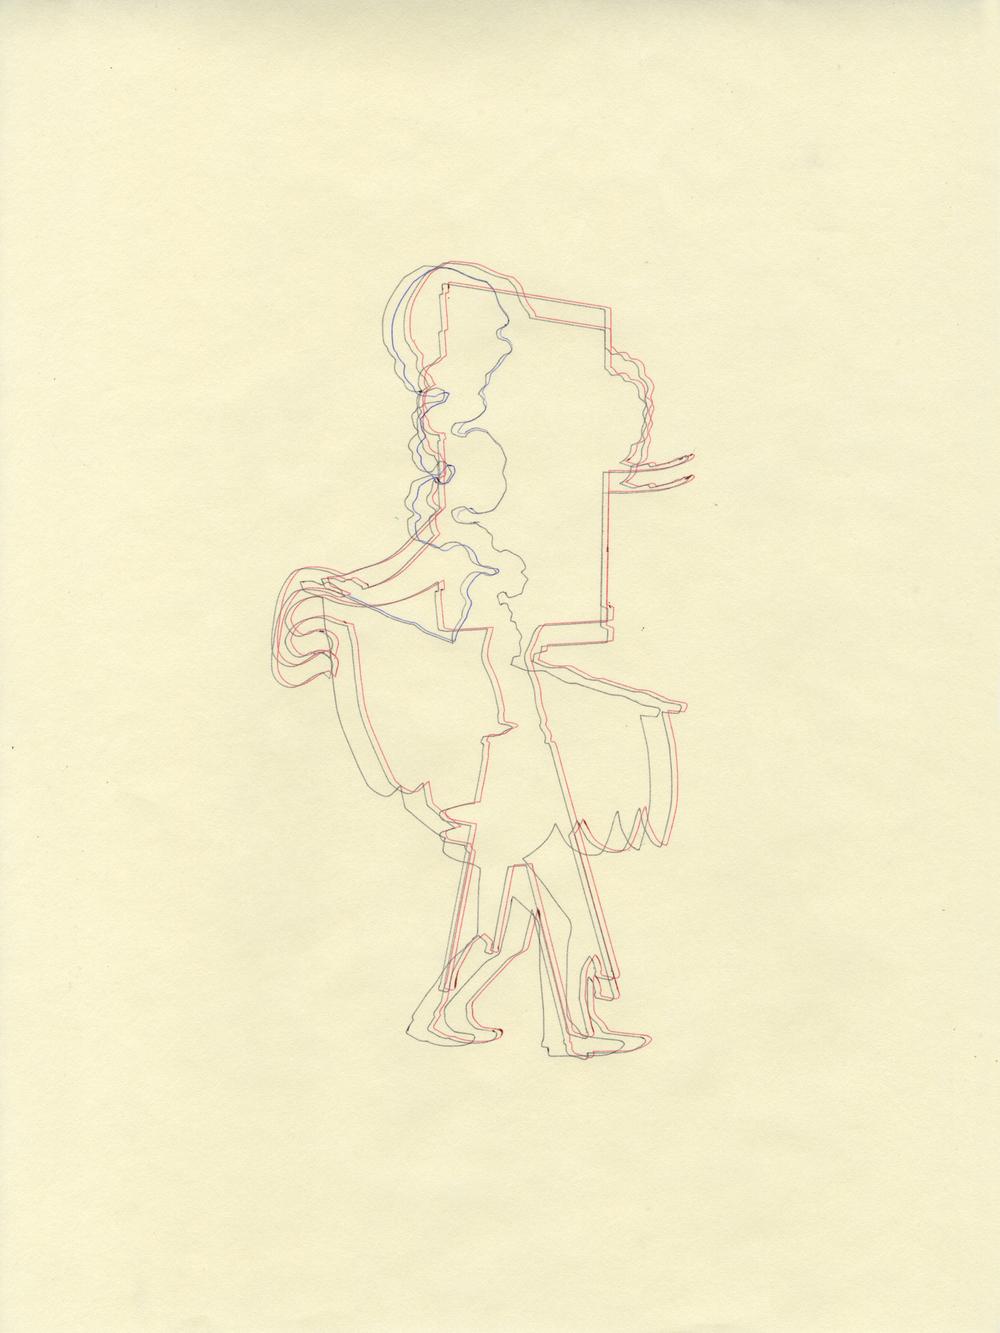 ruhl_13_drawing.jpg